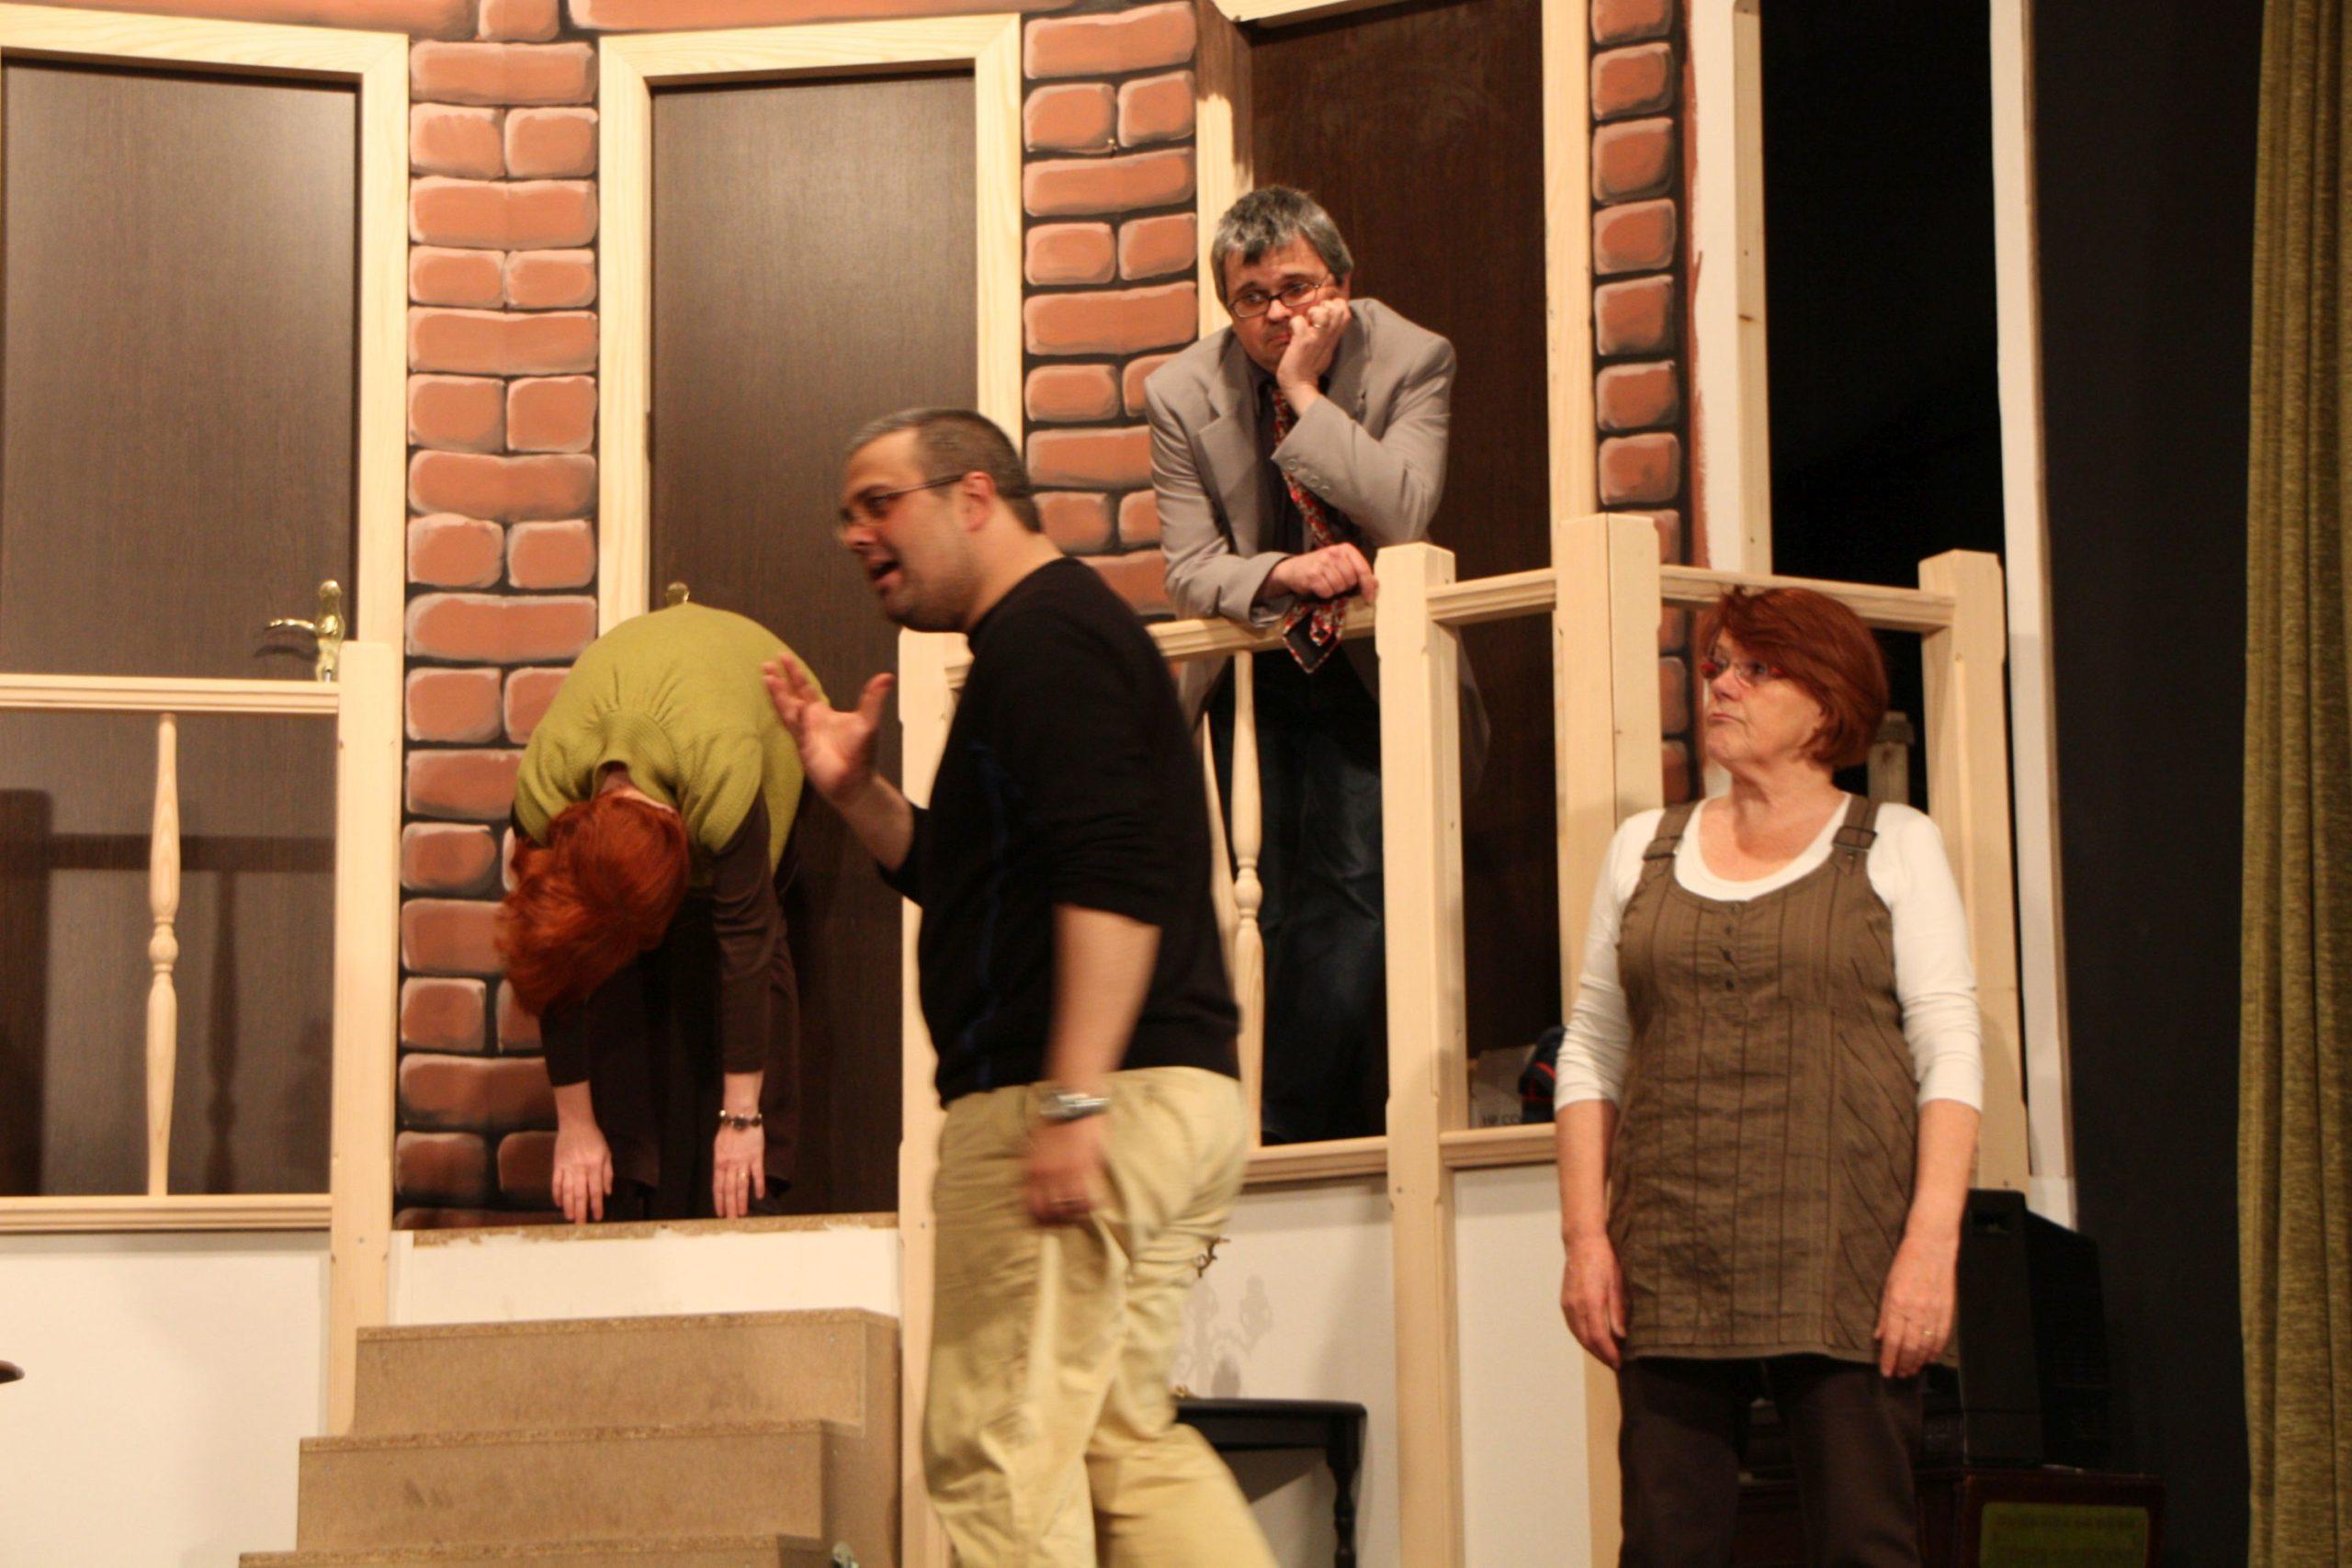 Der Nackte Wahnsinn 2012 - Sulzbacher Kellertheater